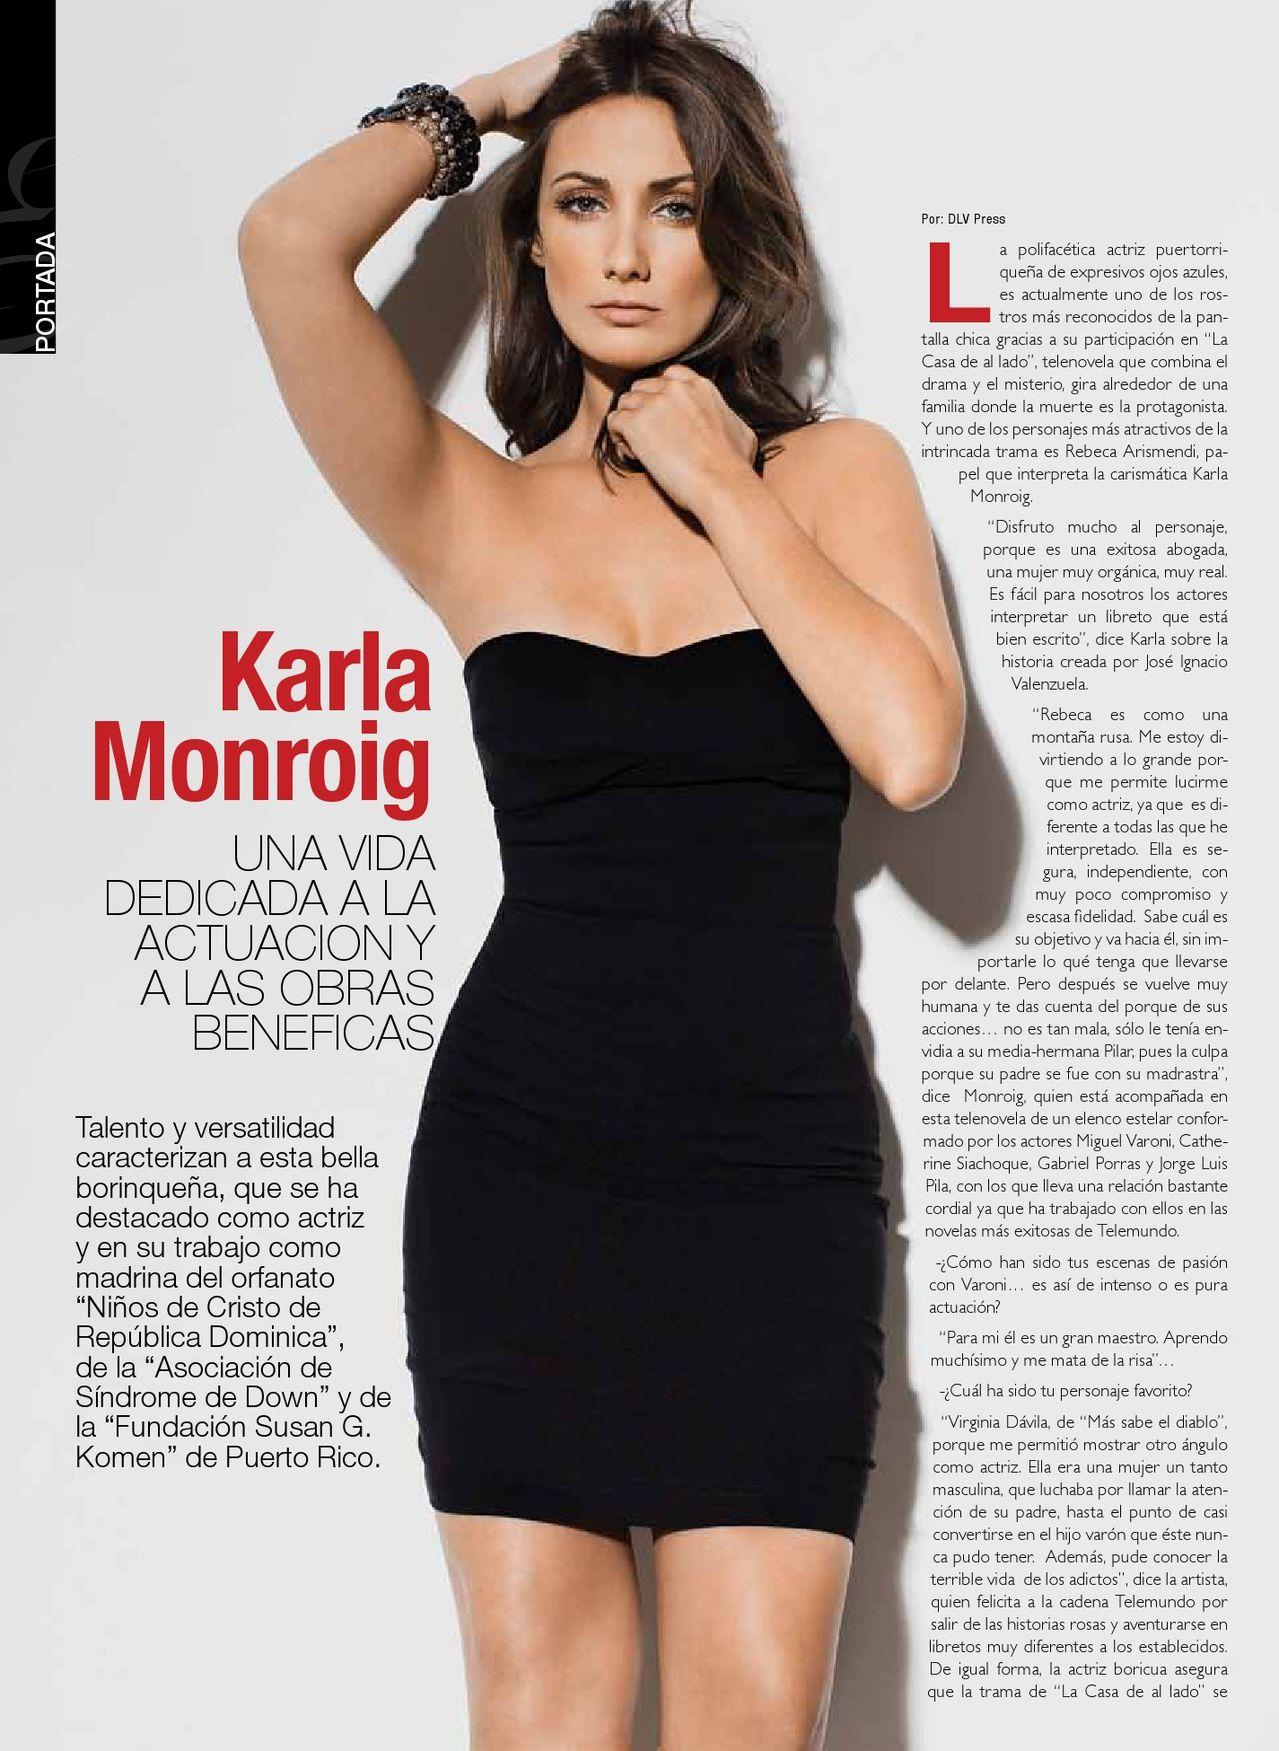 karla monroig/კარლა მონროიგი - Page 6 Karlamonroig0009